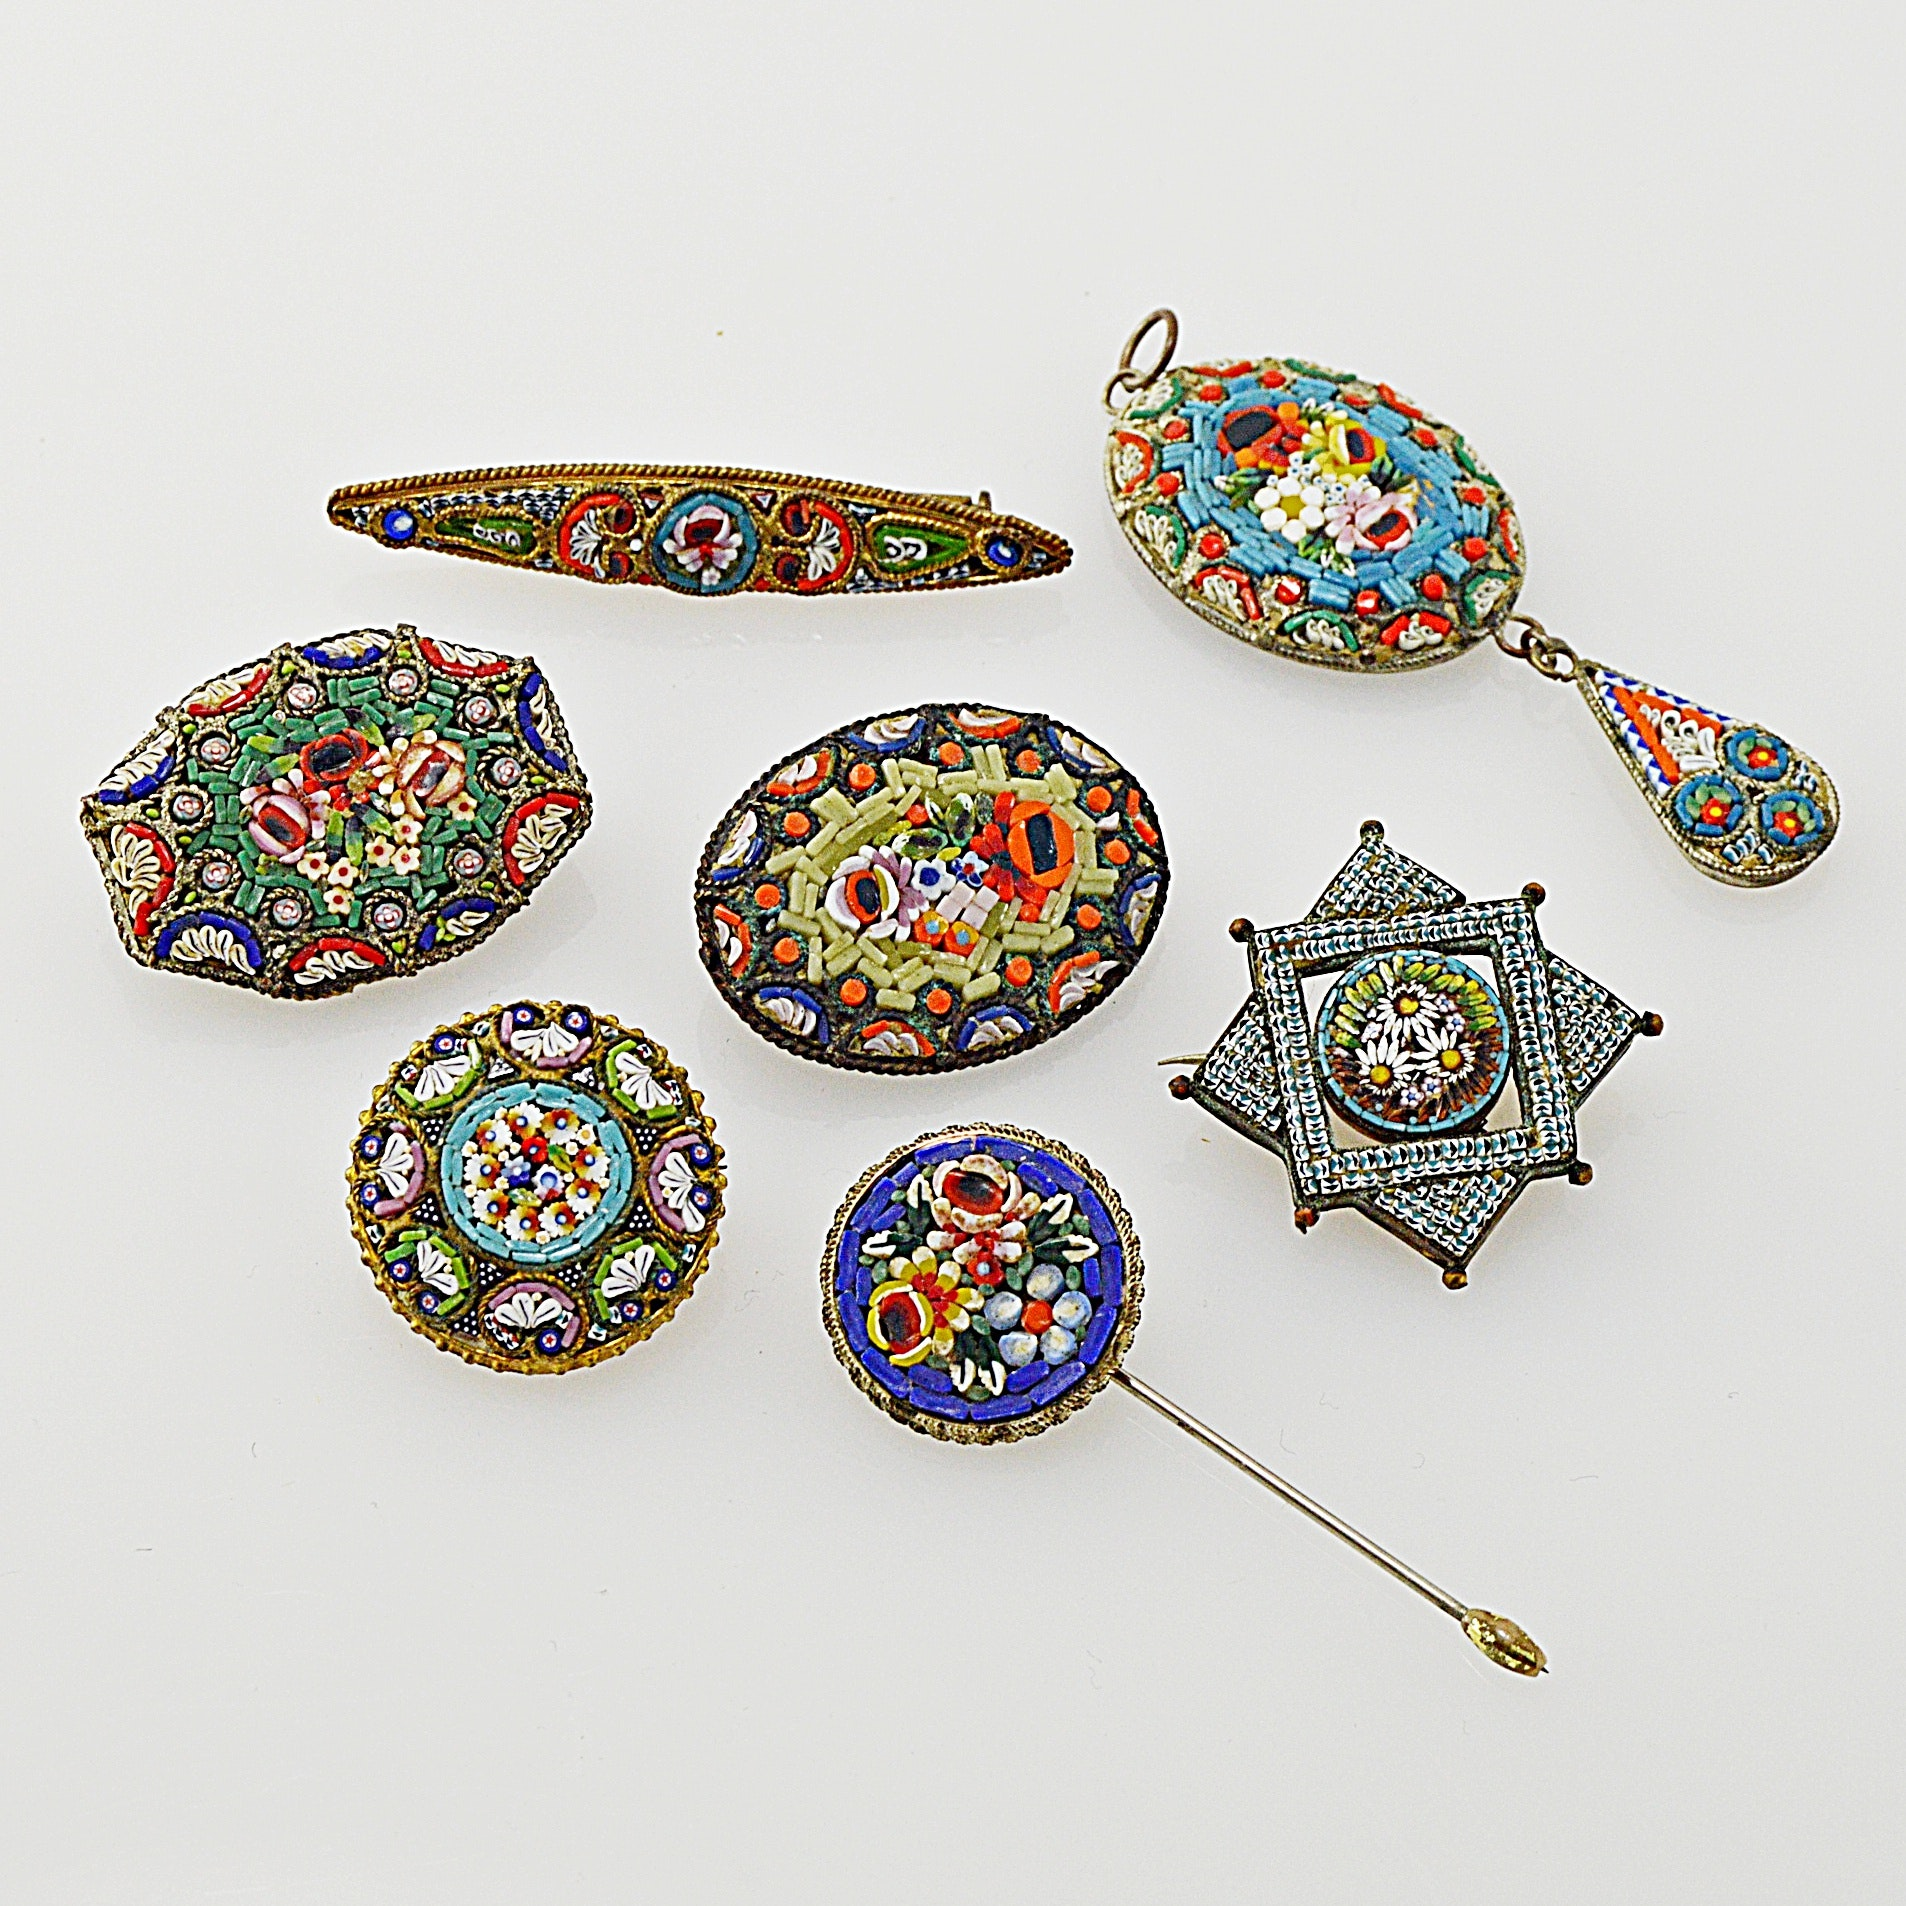 Vintage Italian Micro Mosaic Jewelry